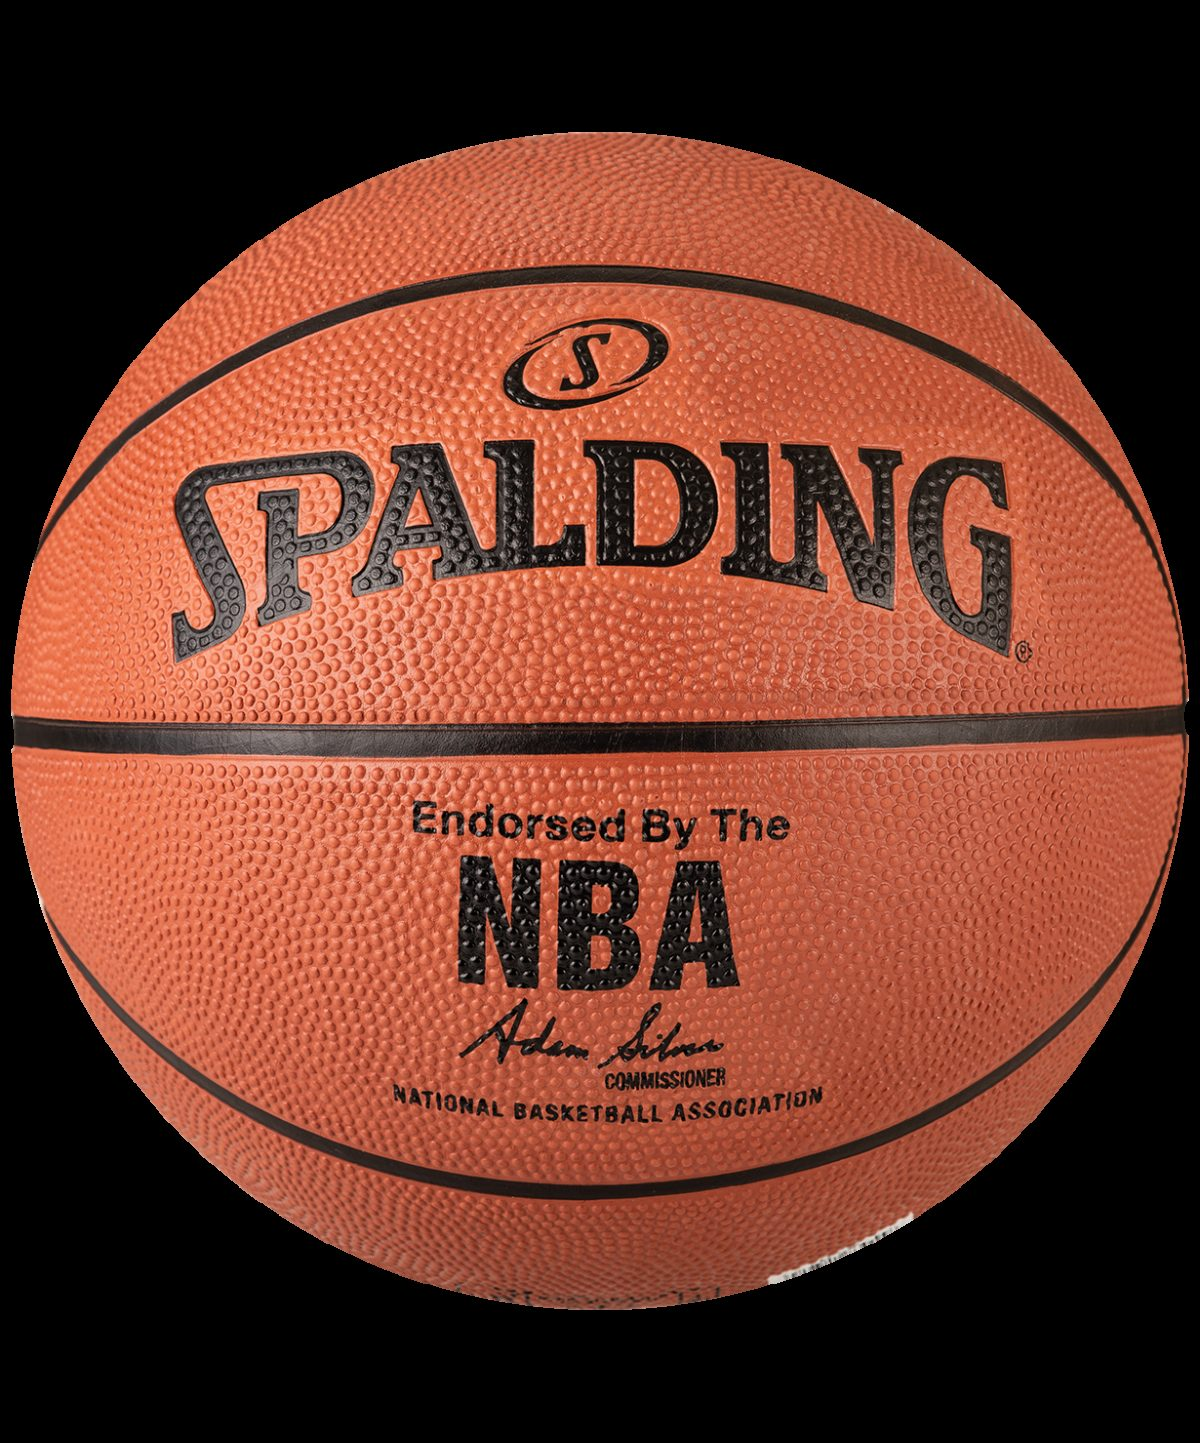 SPALDING NBA Silver мяч баскетбольный №6 - 2